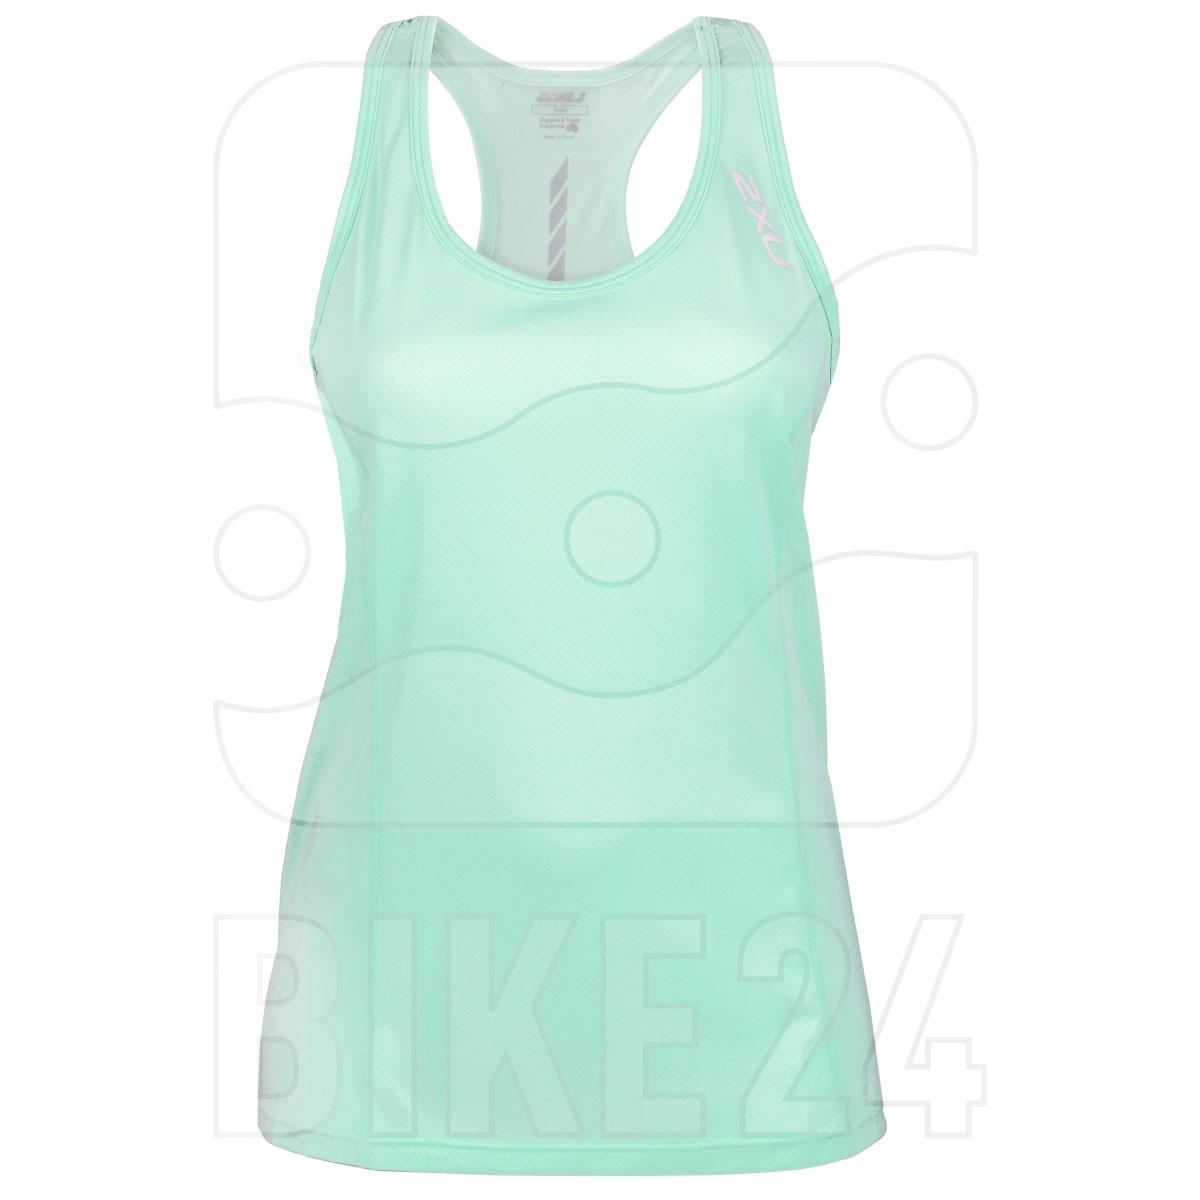 2XU GHST Short Sleeve Women's Singlet - mint/white reflective